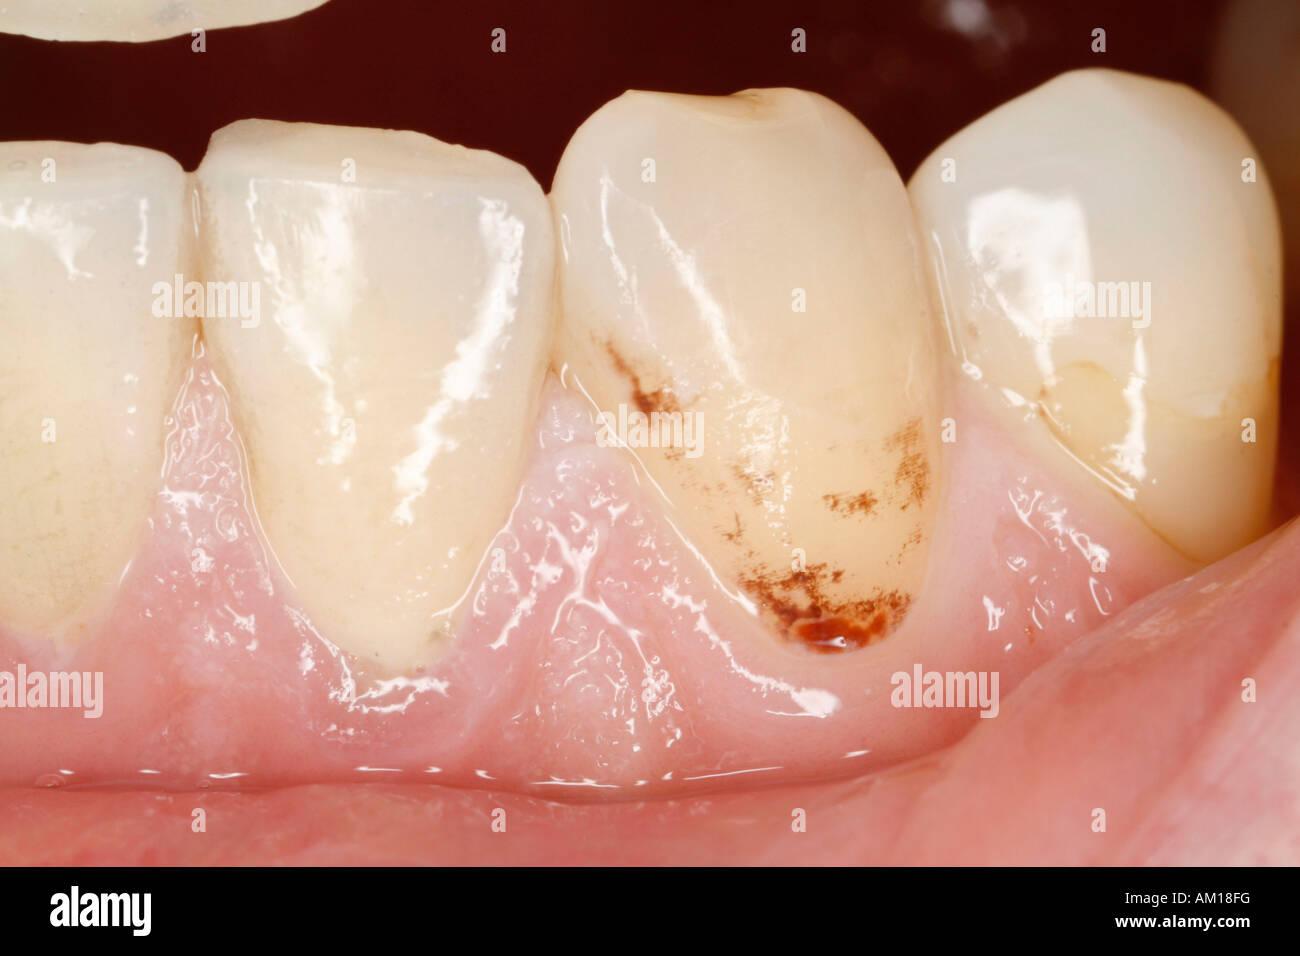 Eklige zähne